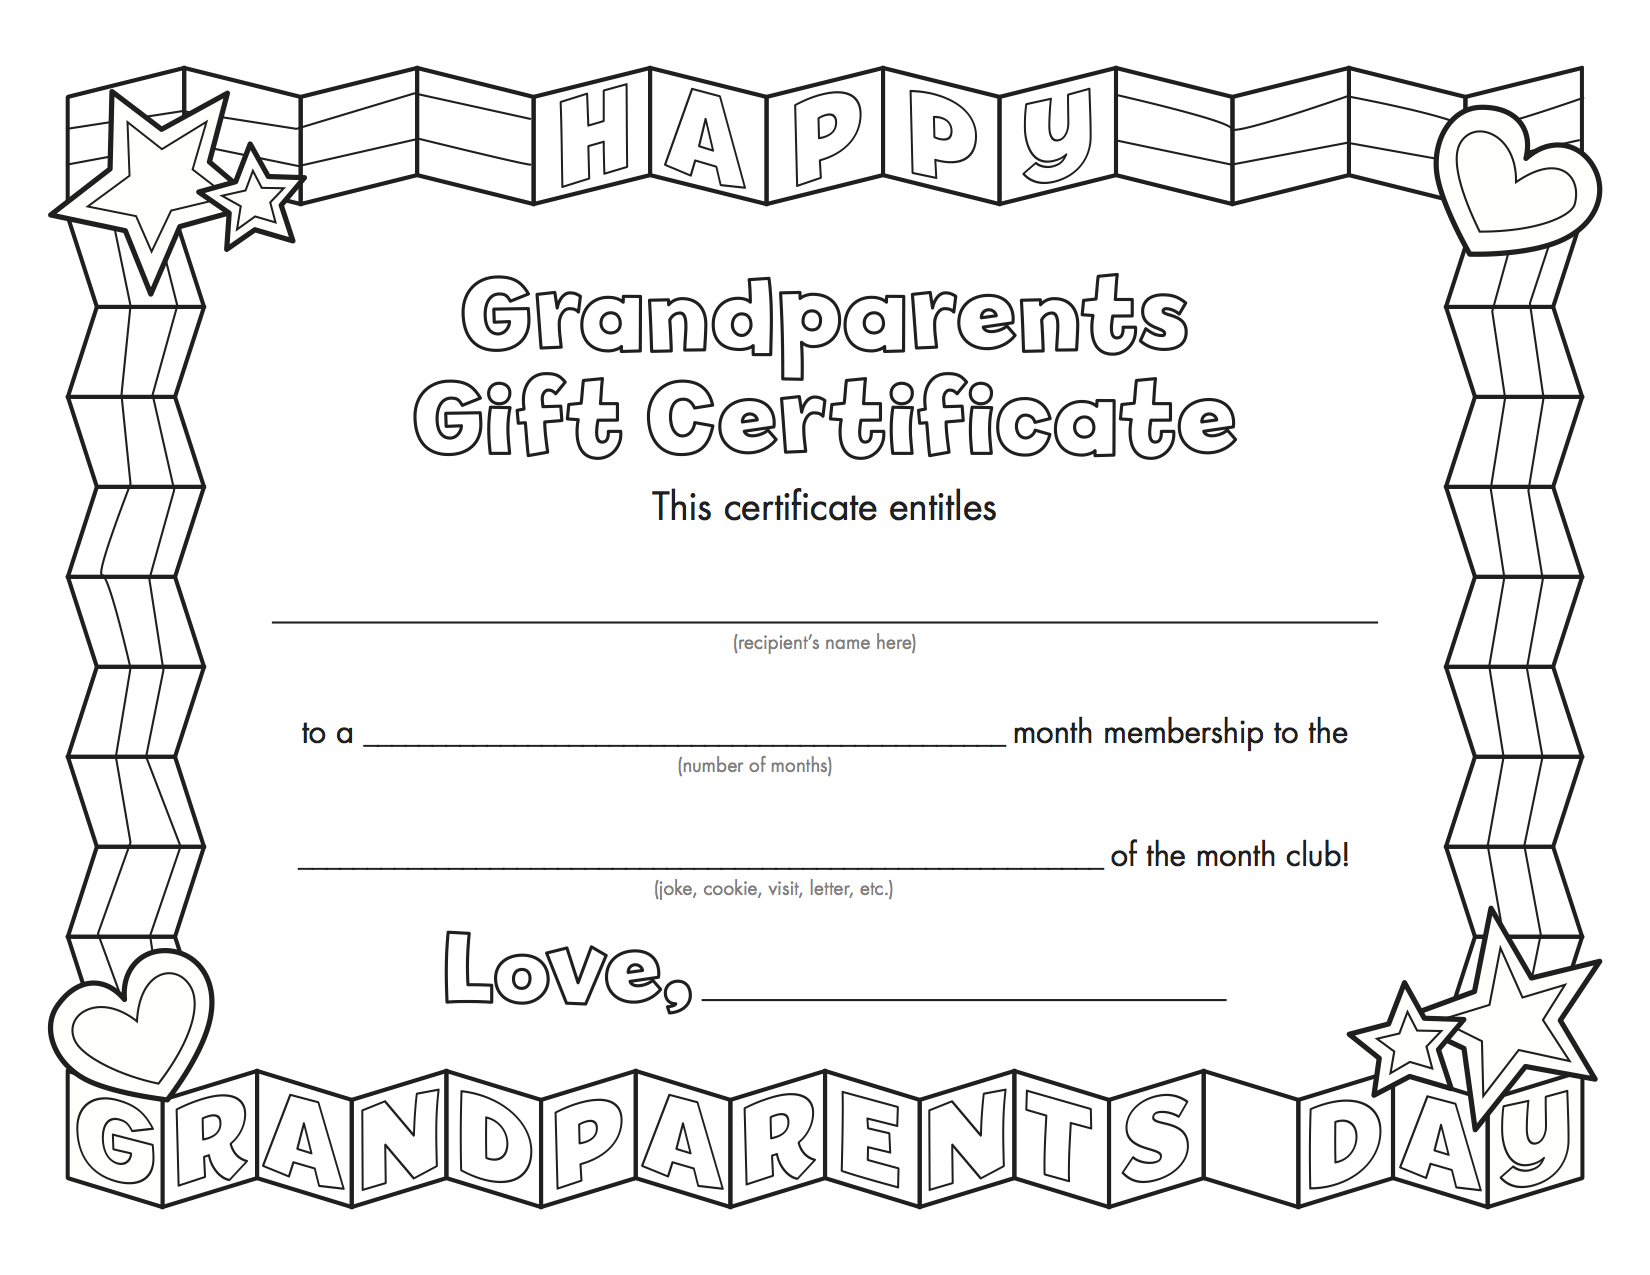 Grandparentsday Copy